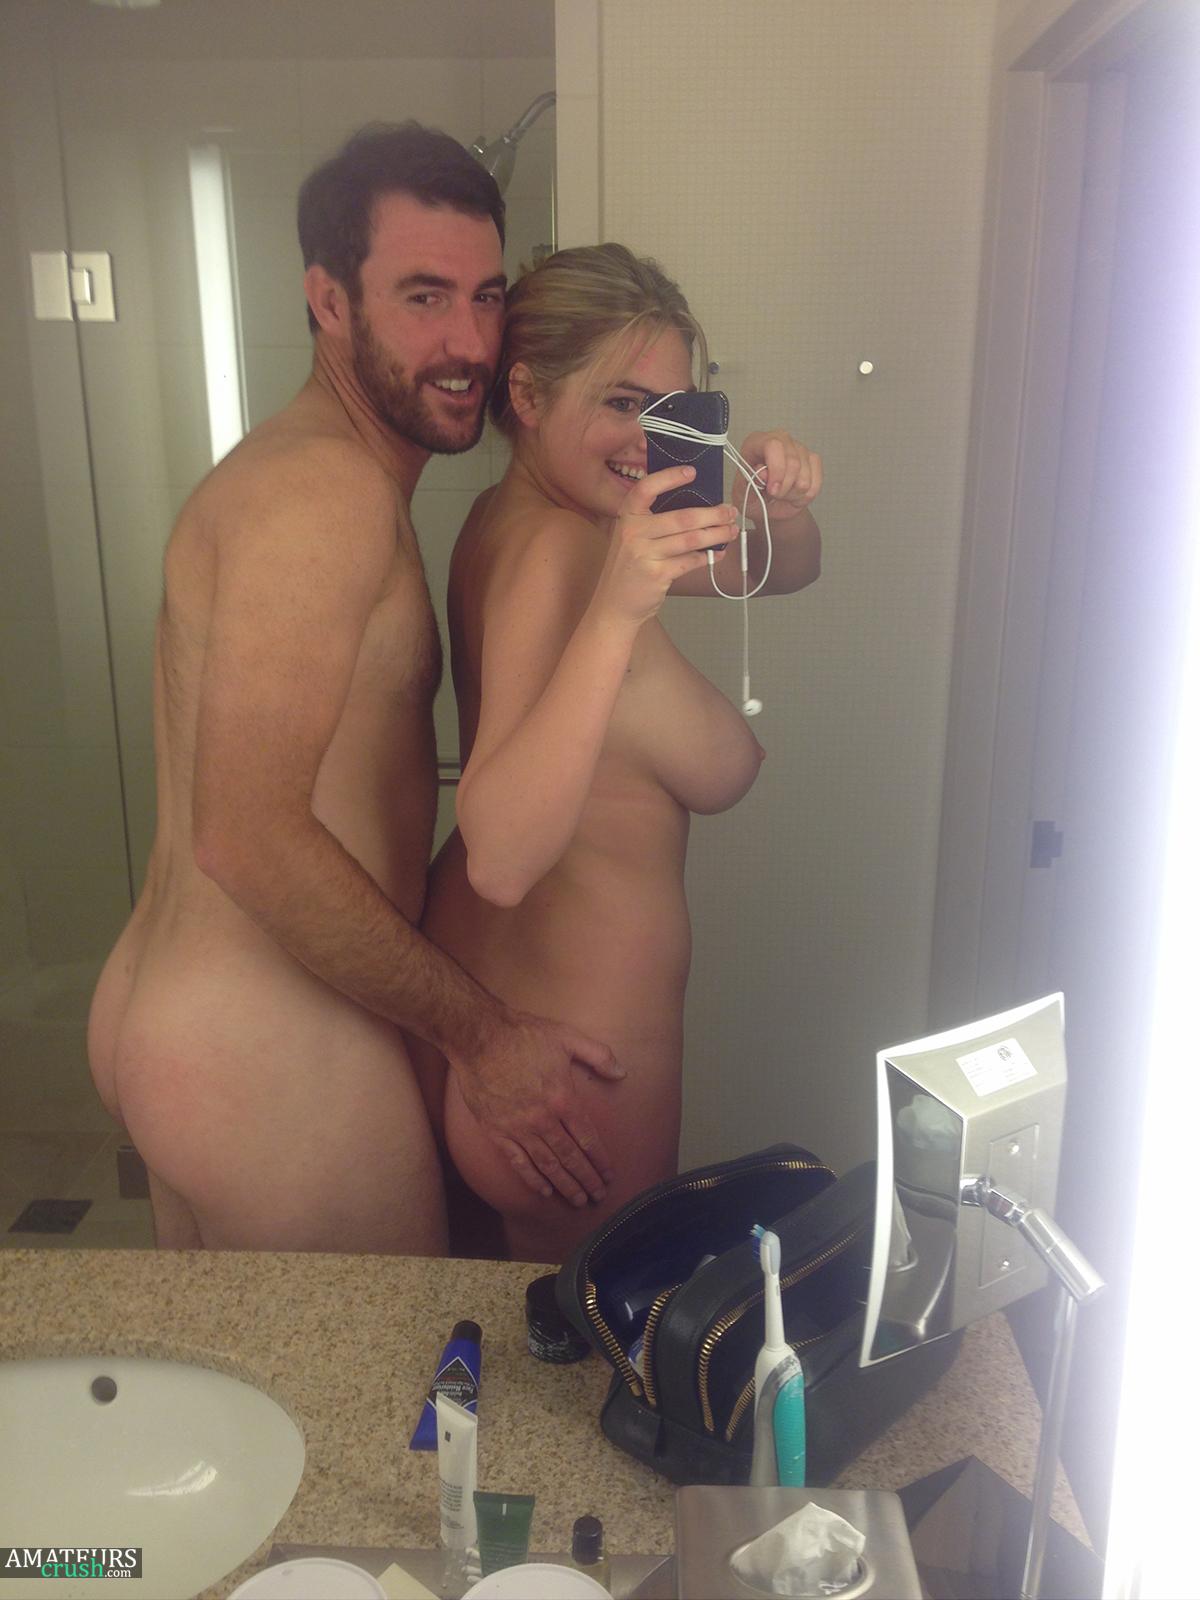 Kate upton nude photos hot leaked naked pics of kate upton